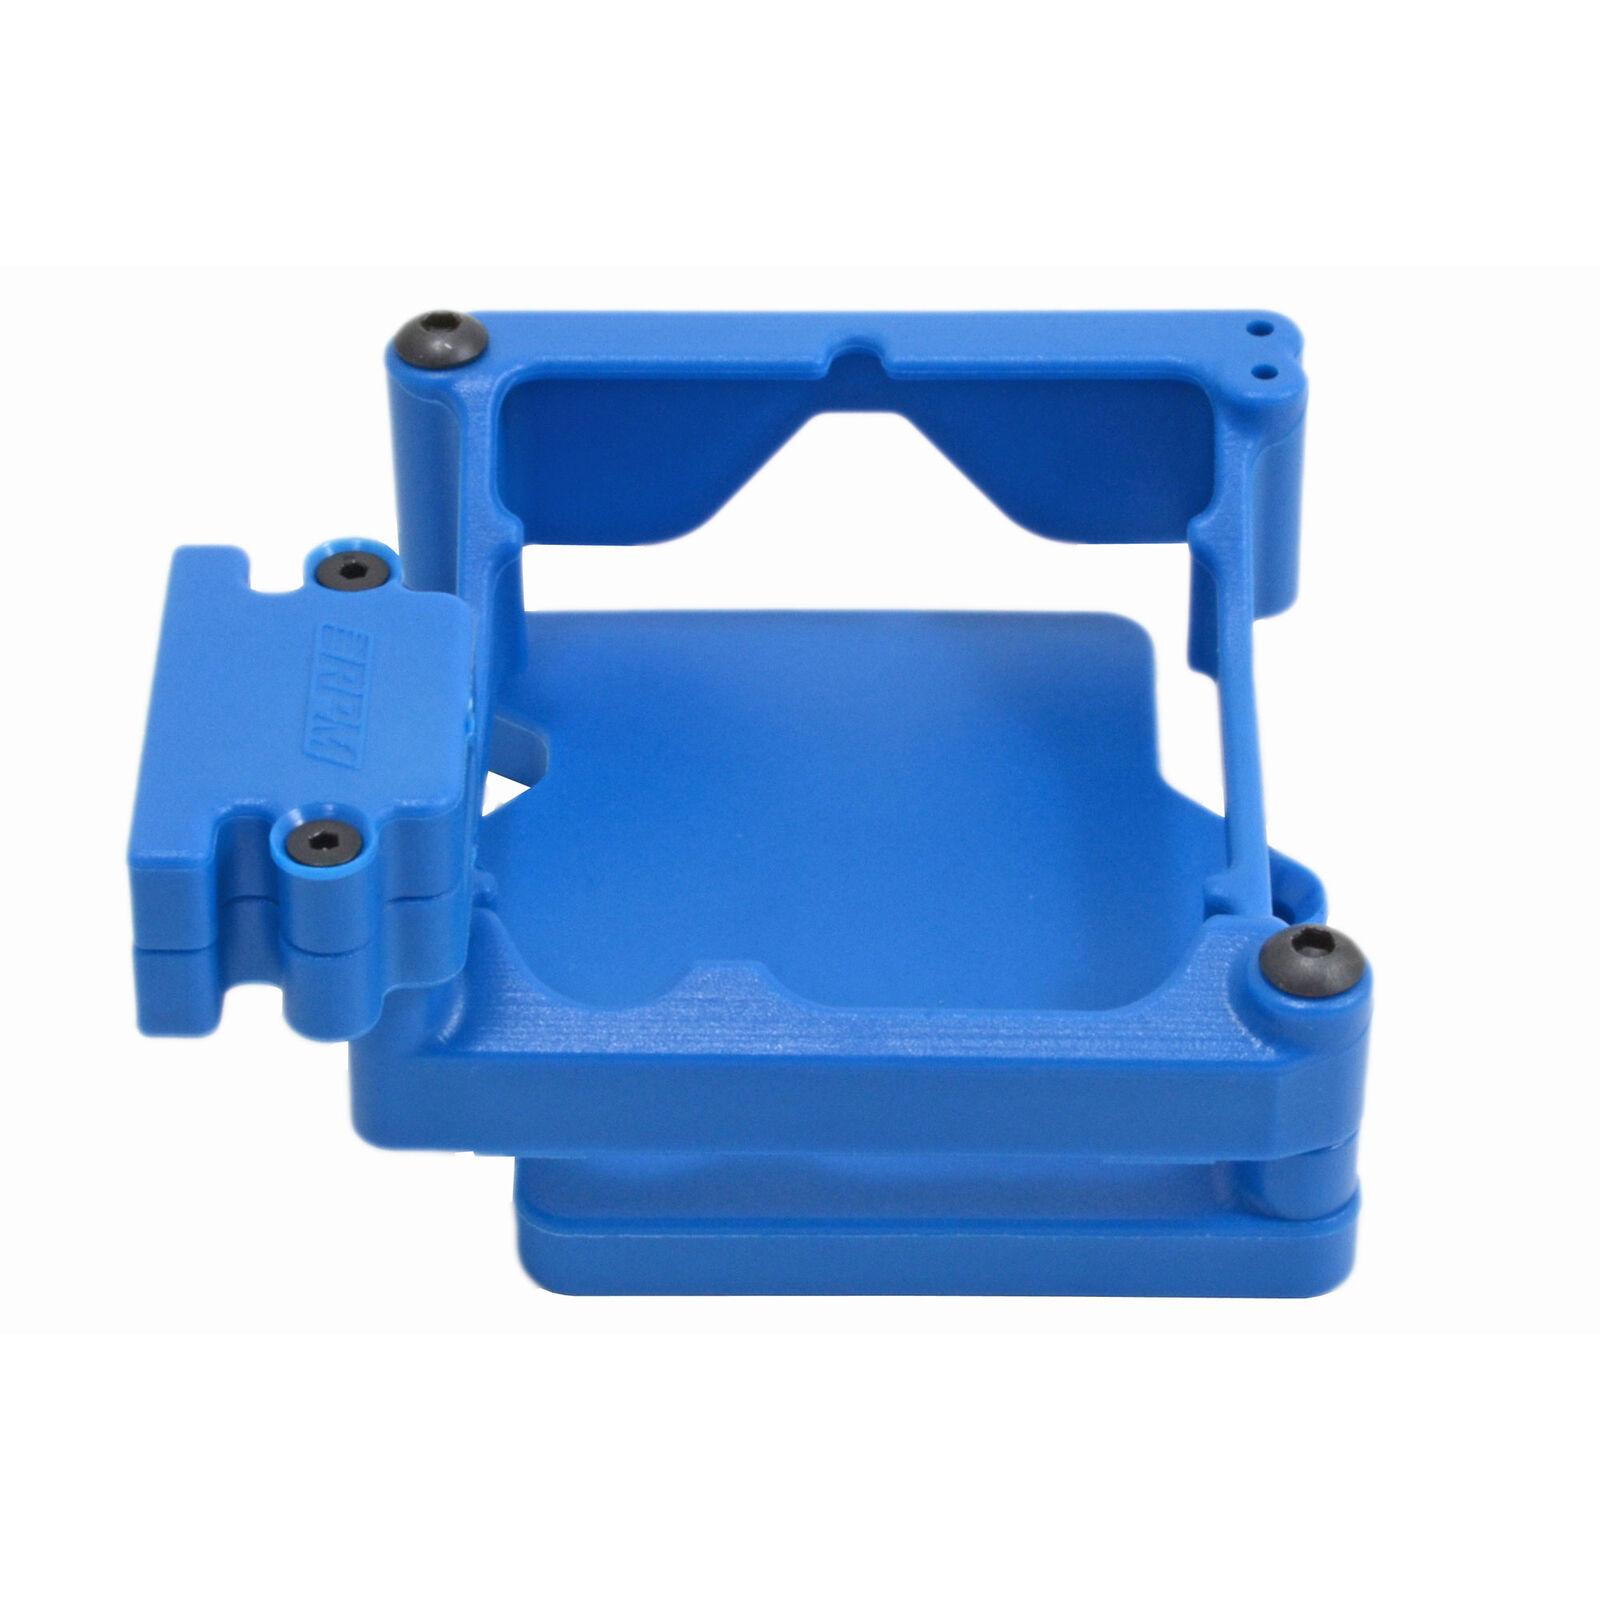 ESC Cage, Blue: Castle Sidewinder 4 ESC